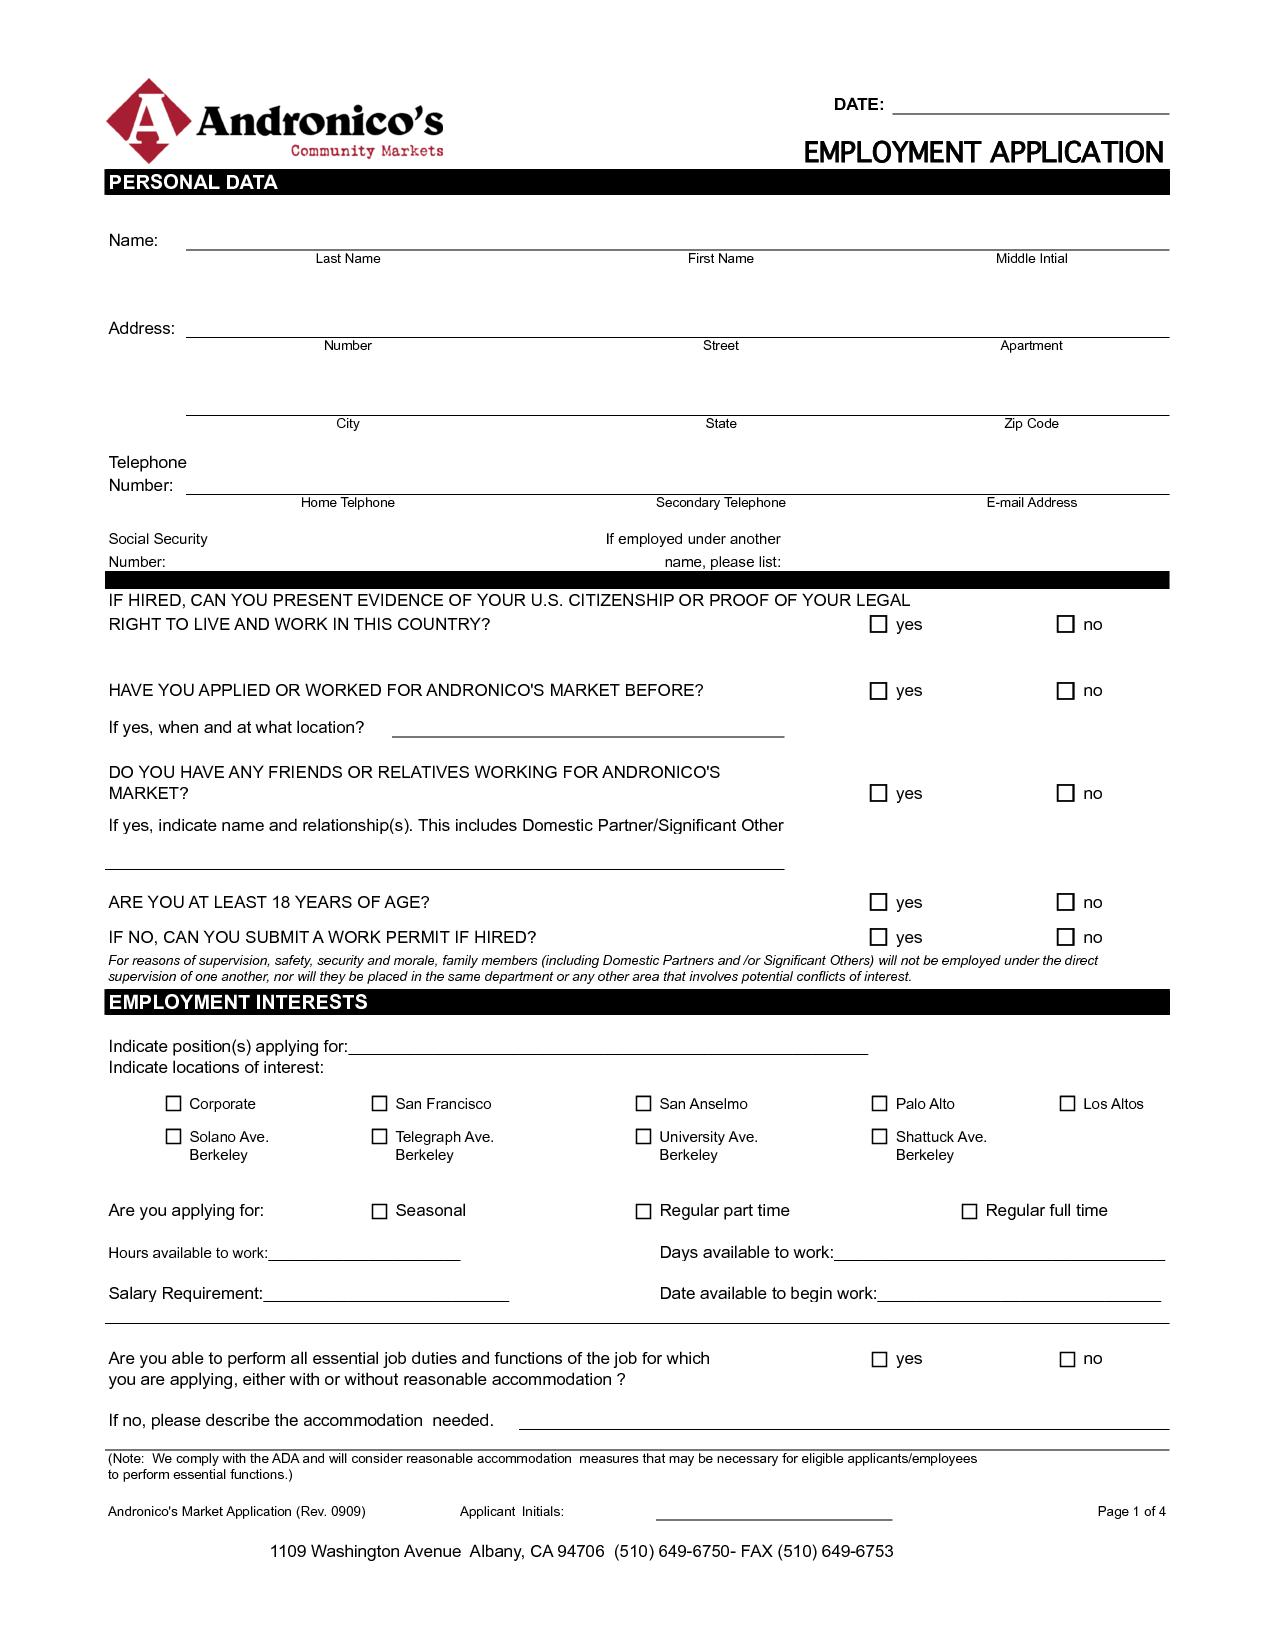 Blank Employment Application Template